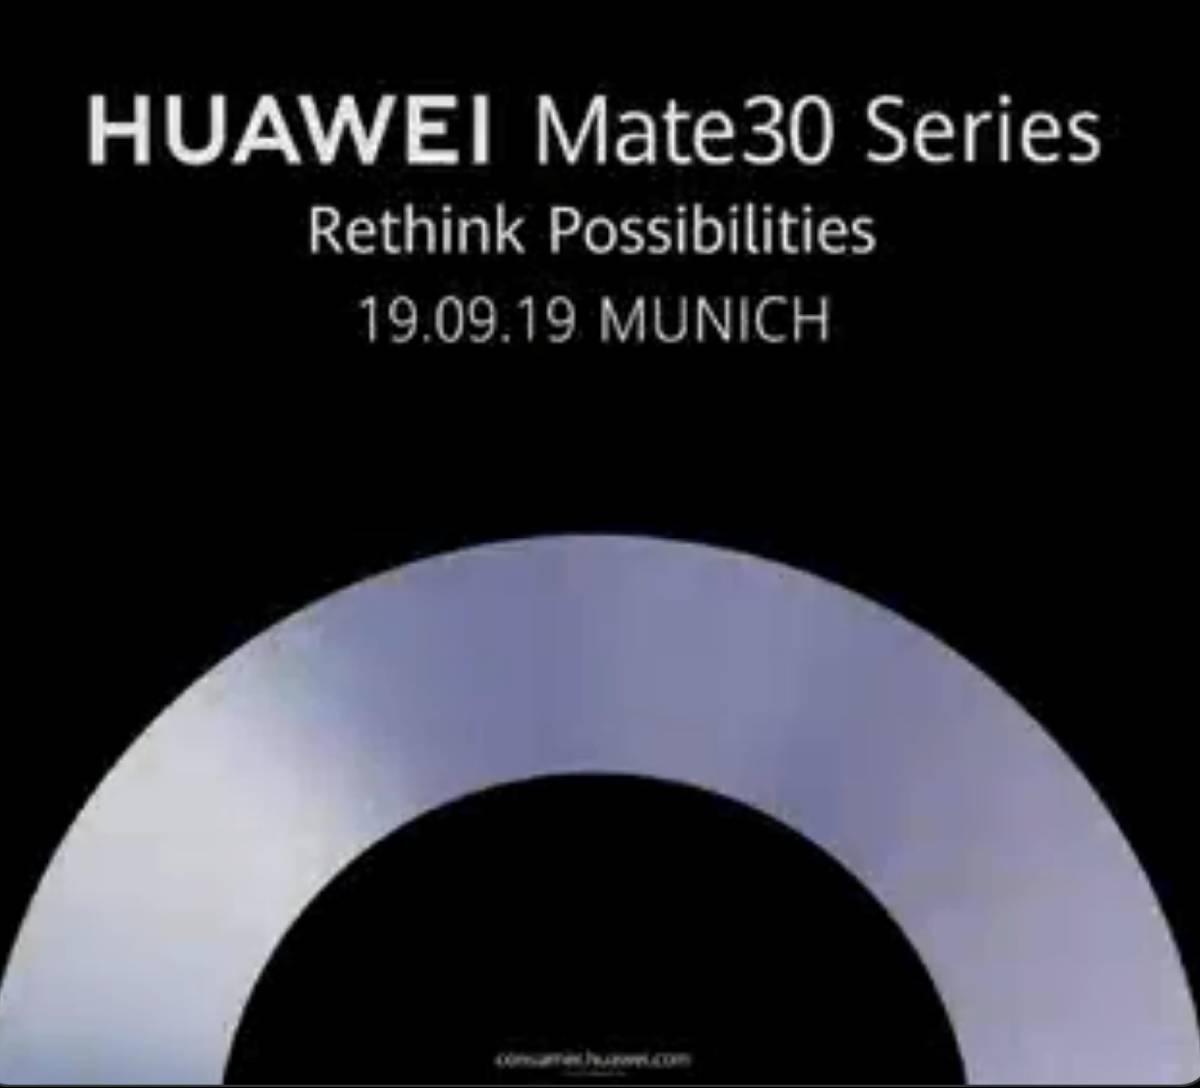 هواوي تكشف رسميا موعد الإعلان عن سلسلة هواتف Mate 30